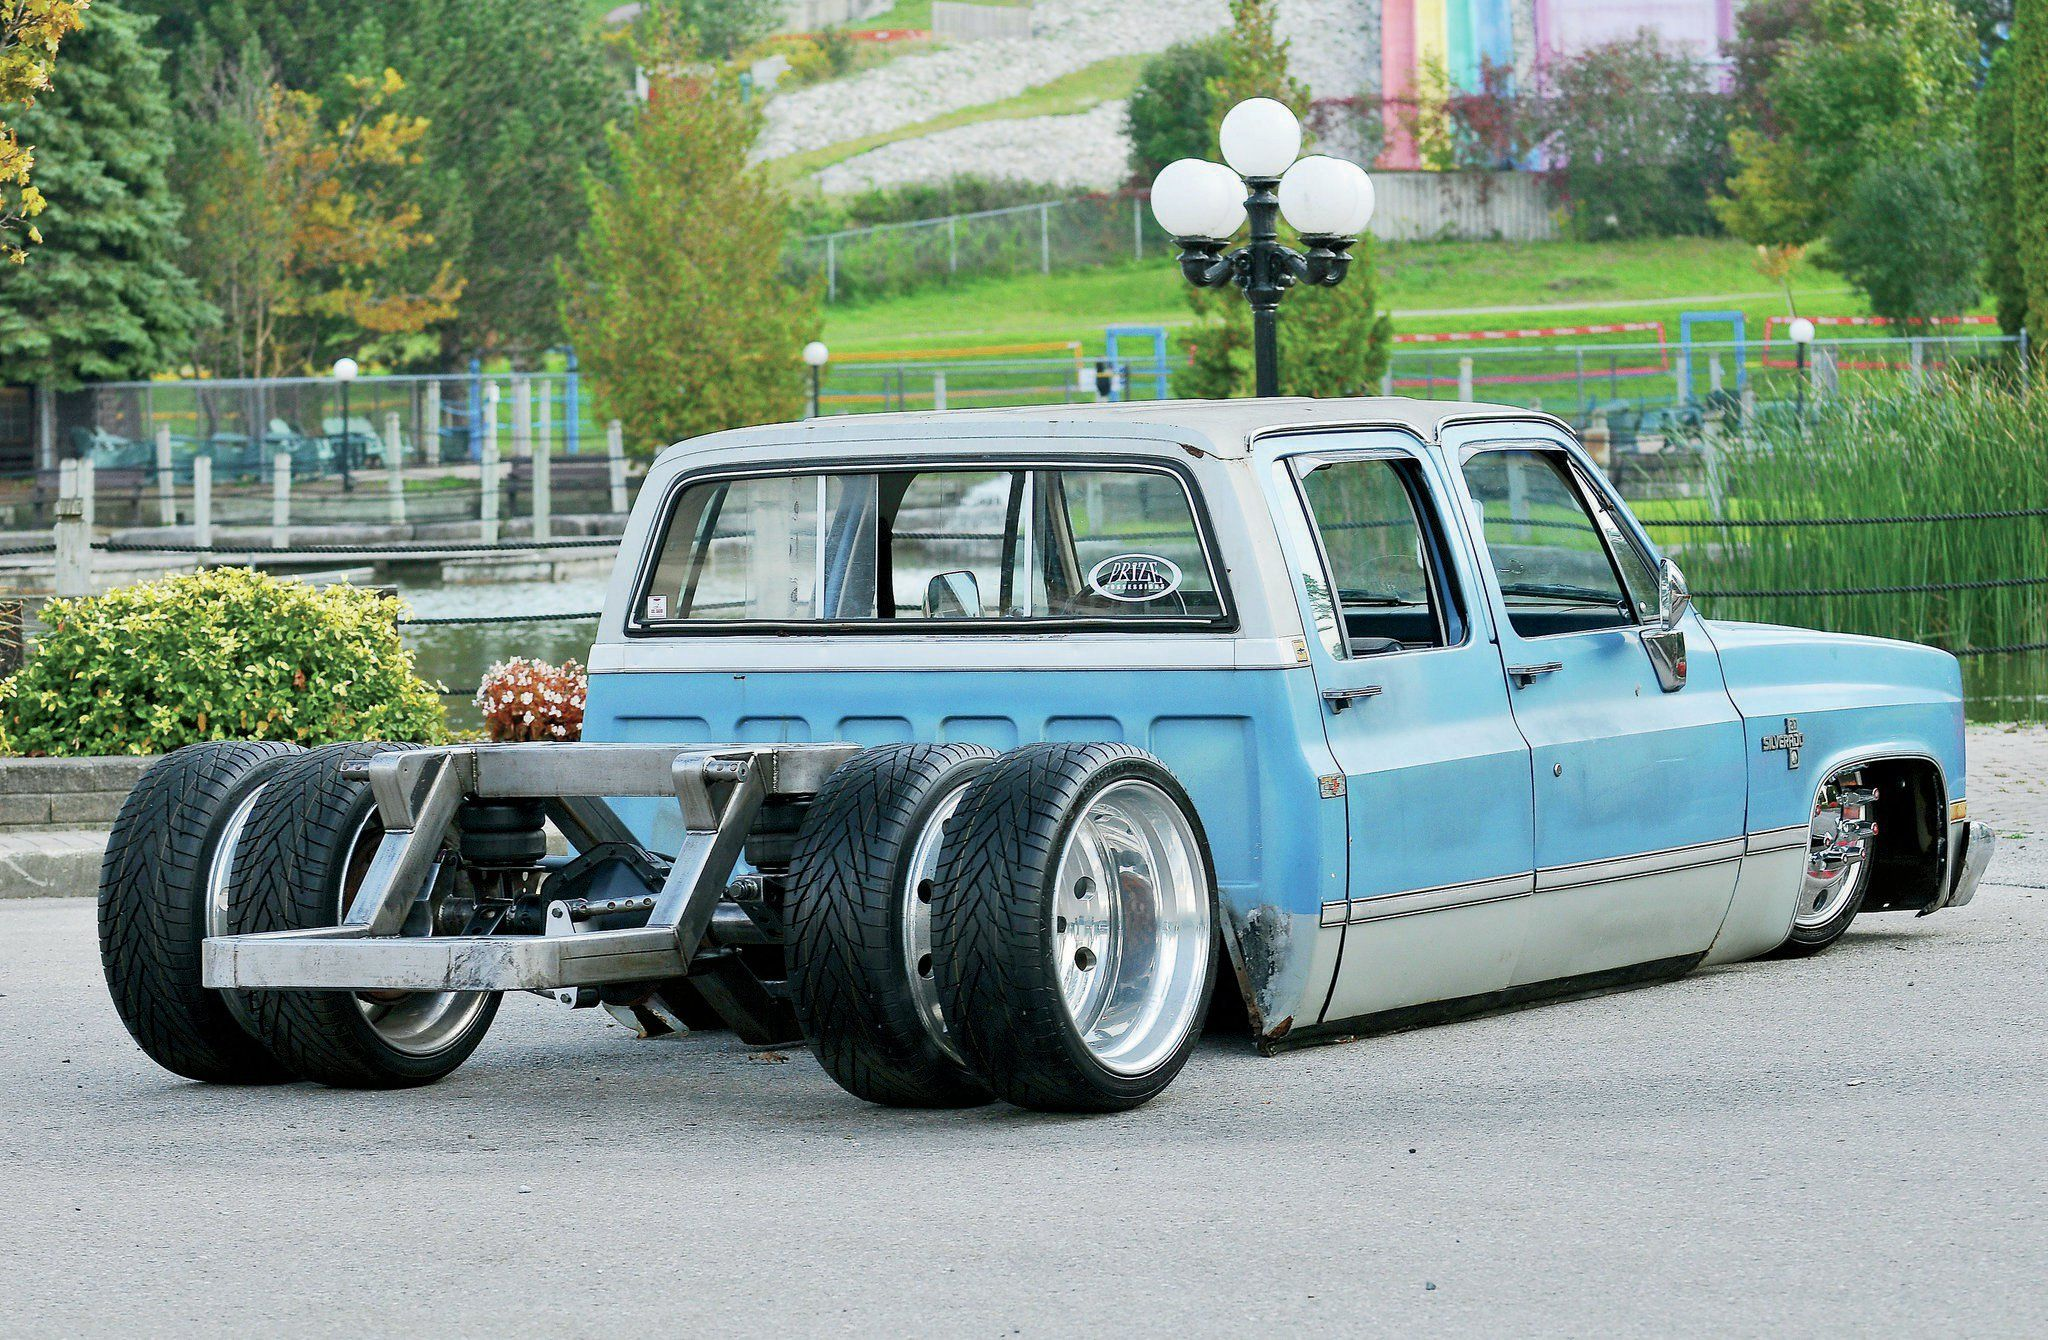 1985 Chevy Crew Cab Under Construcrion Dually Dream